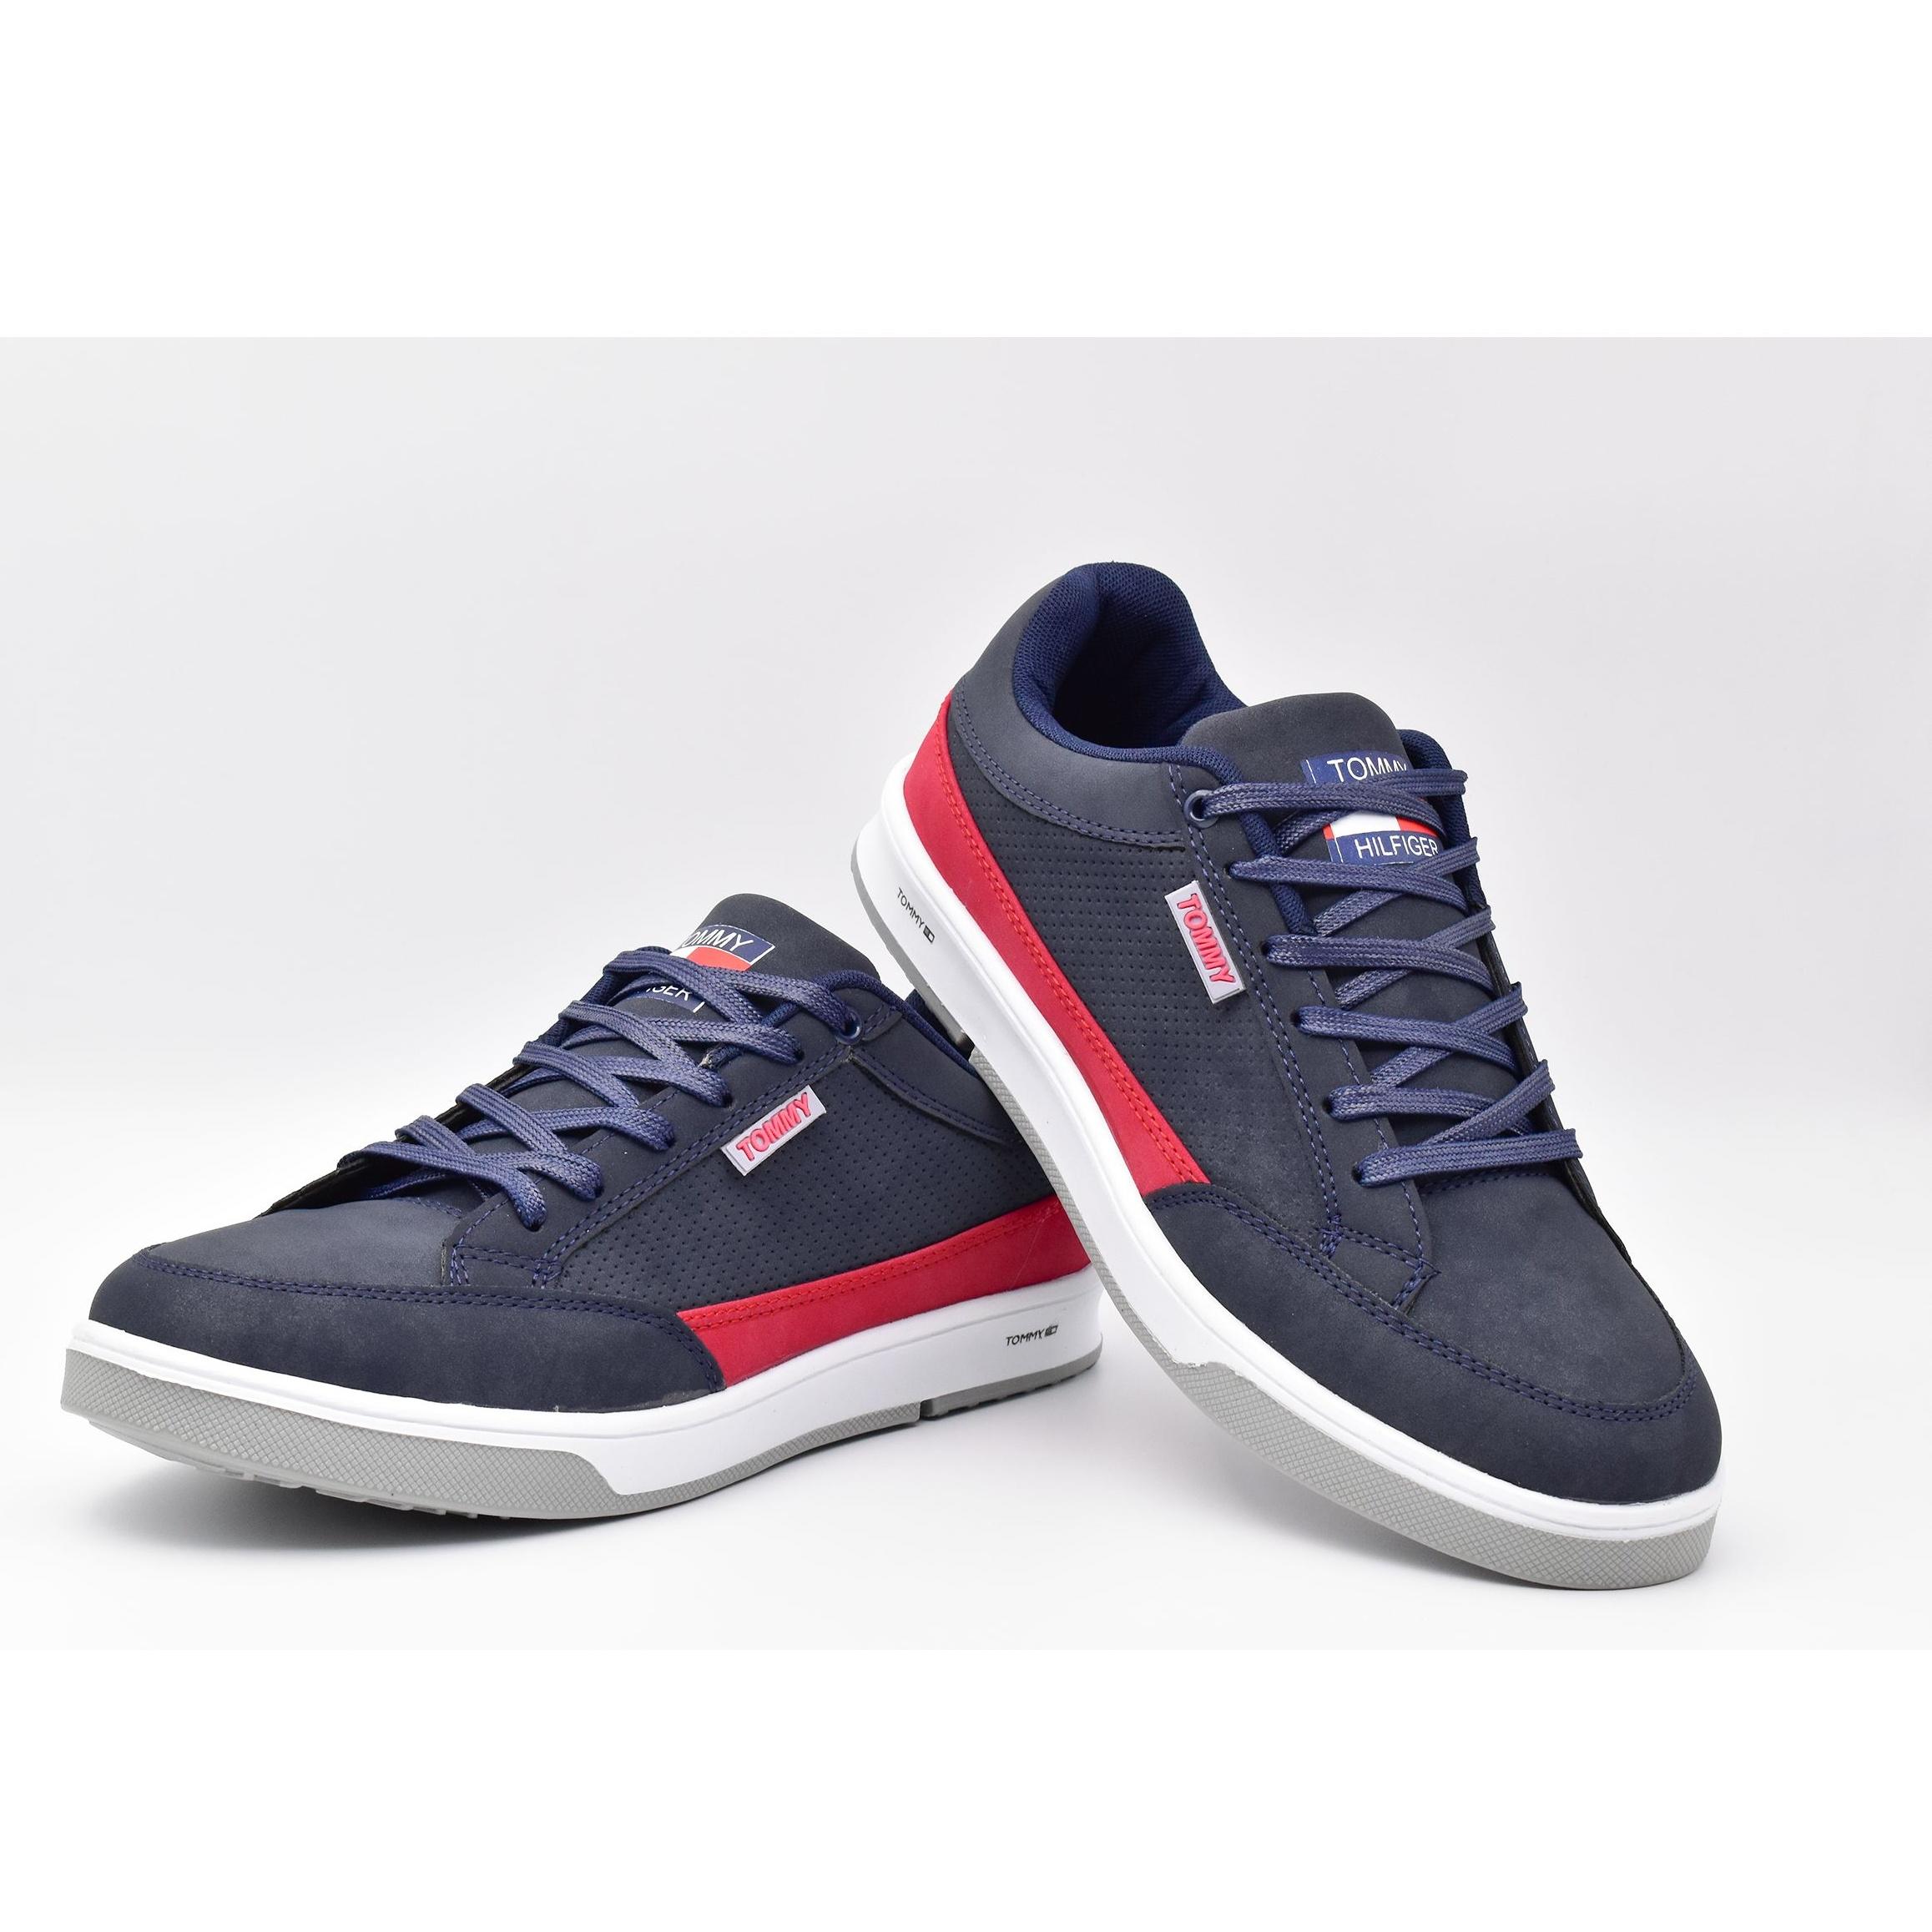 کفش روزمره مردانه مدل رهاورد کد 5513 -  - 6